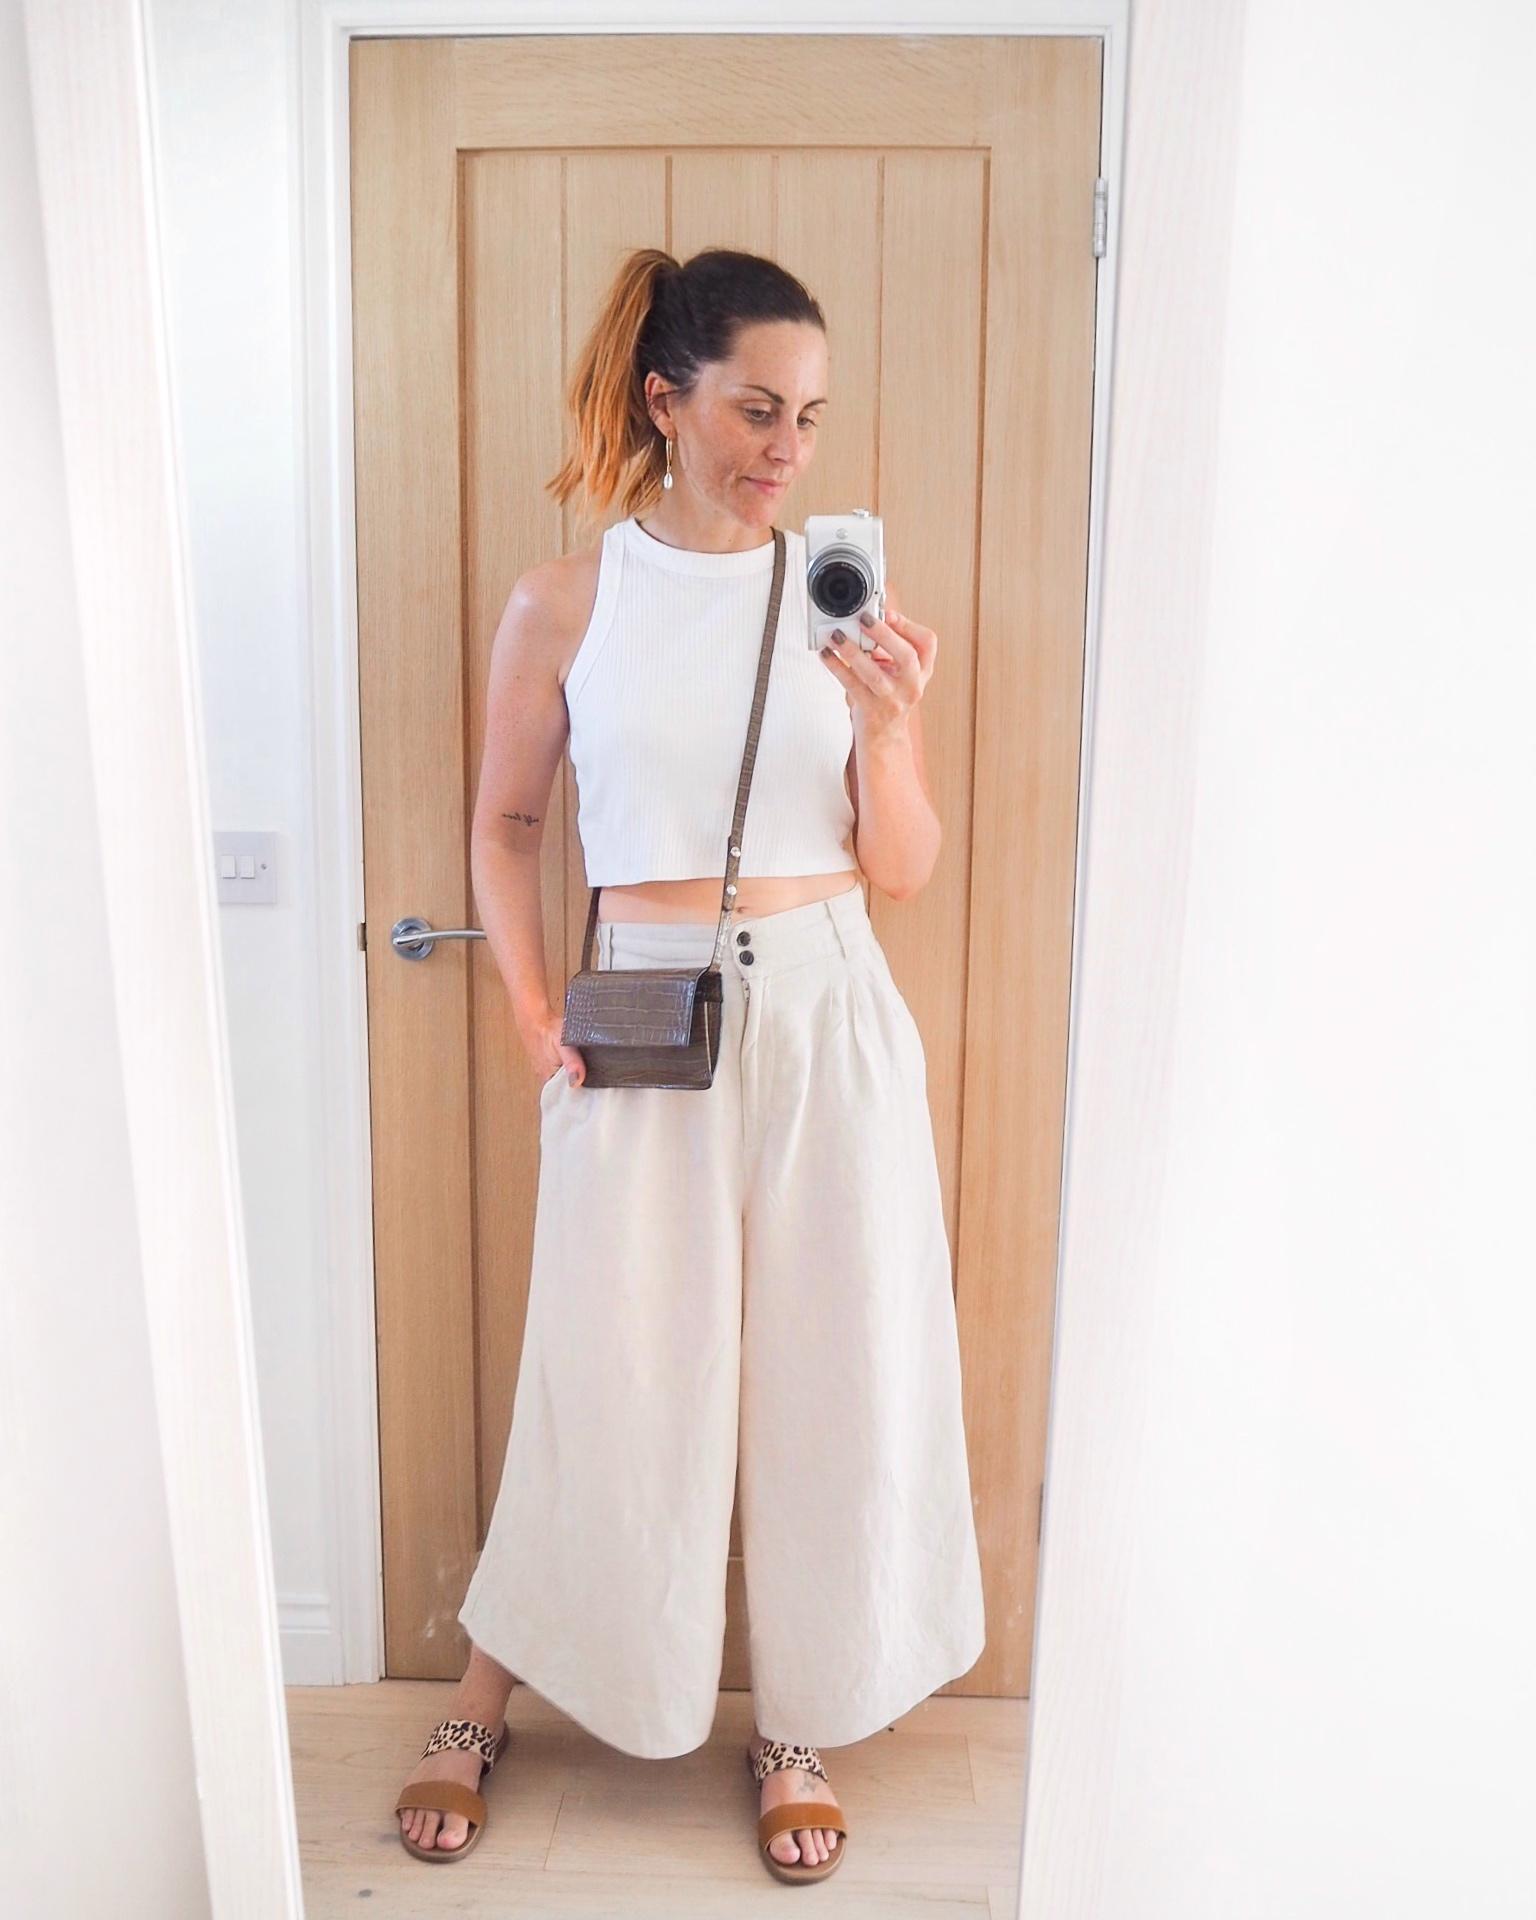 beige linen outfit